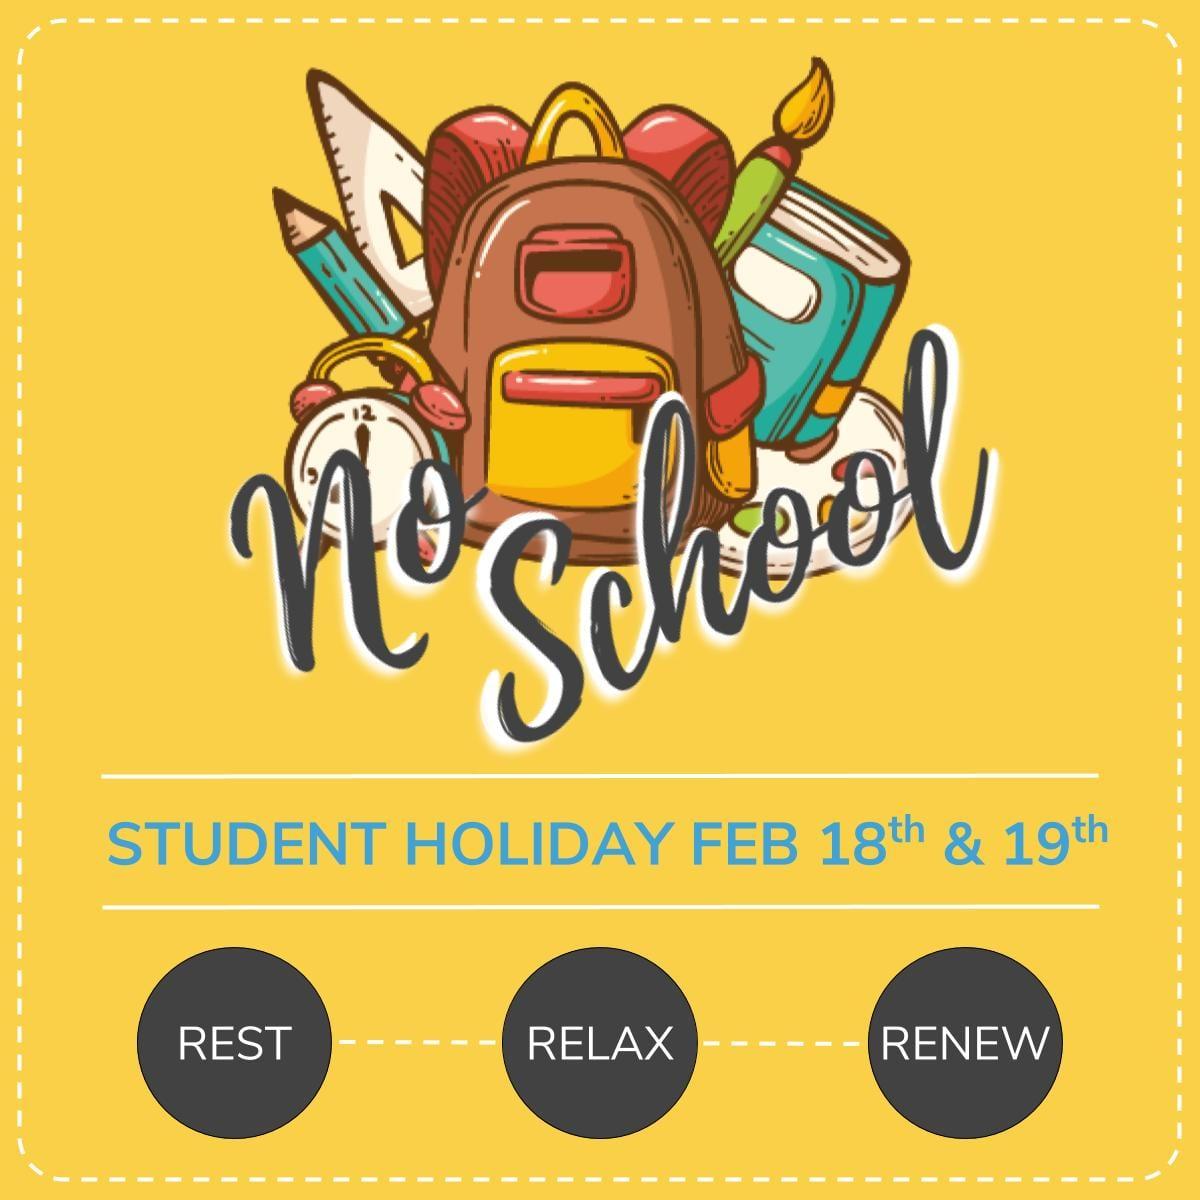 No School Feb. 18th - 19th